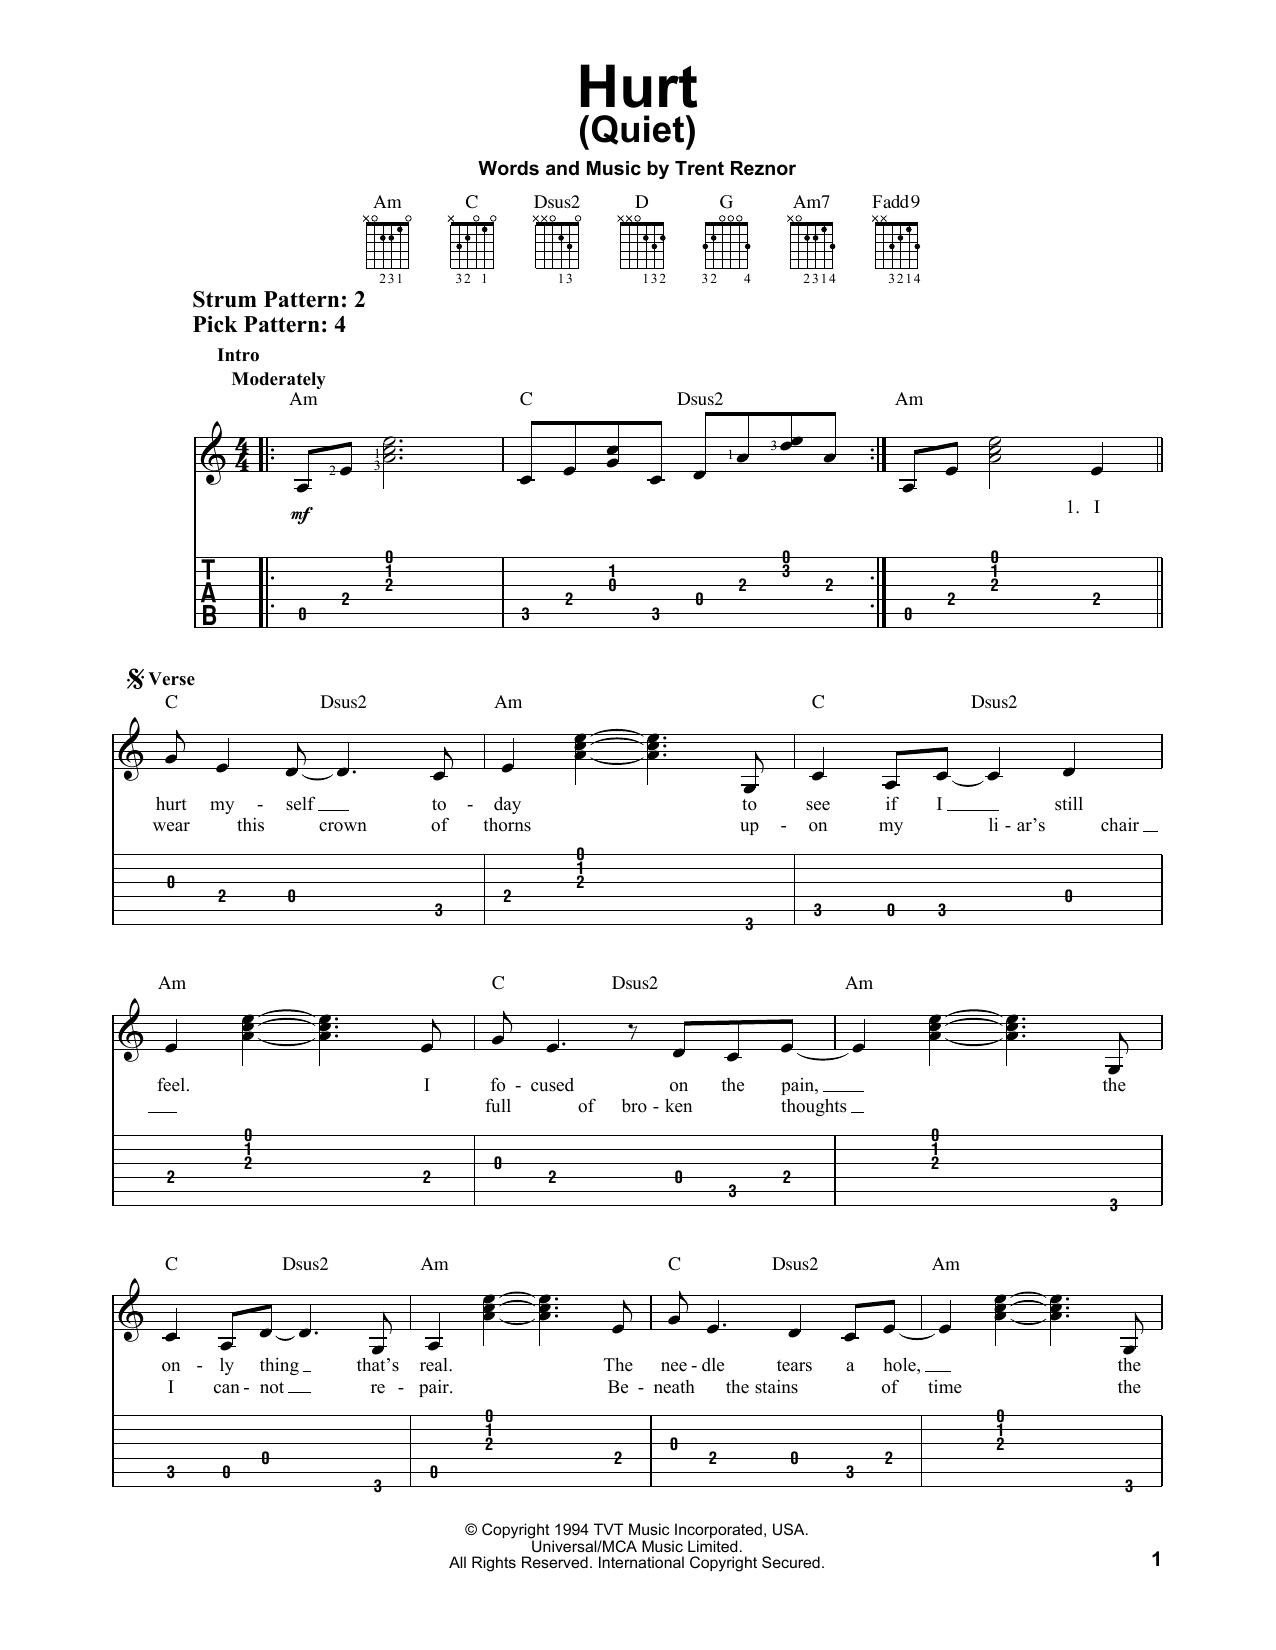 Johnny Cash Hurt Quiet Sheet Music Notes, Chords   Download Printable  Guitar Chords/Lyrics PDF Score   SKU 15